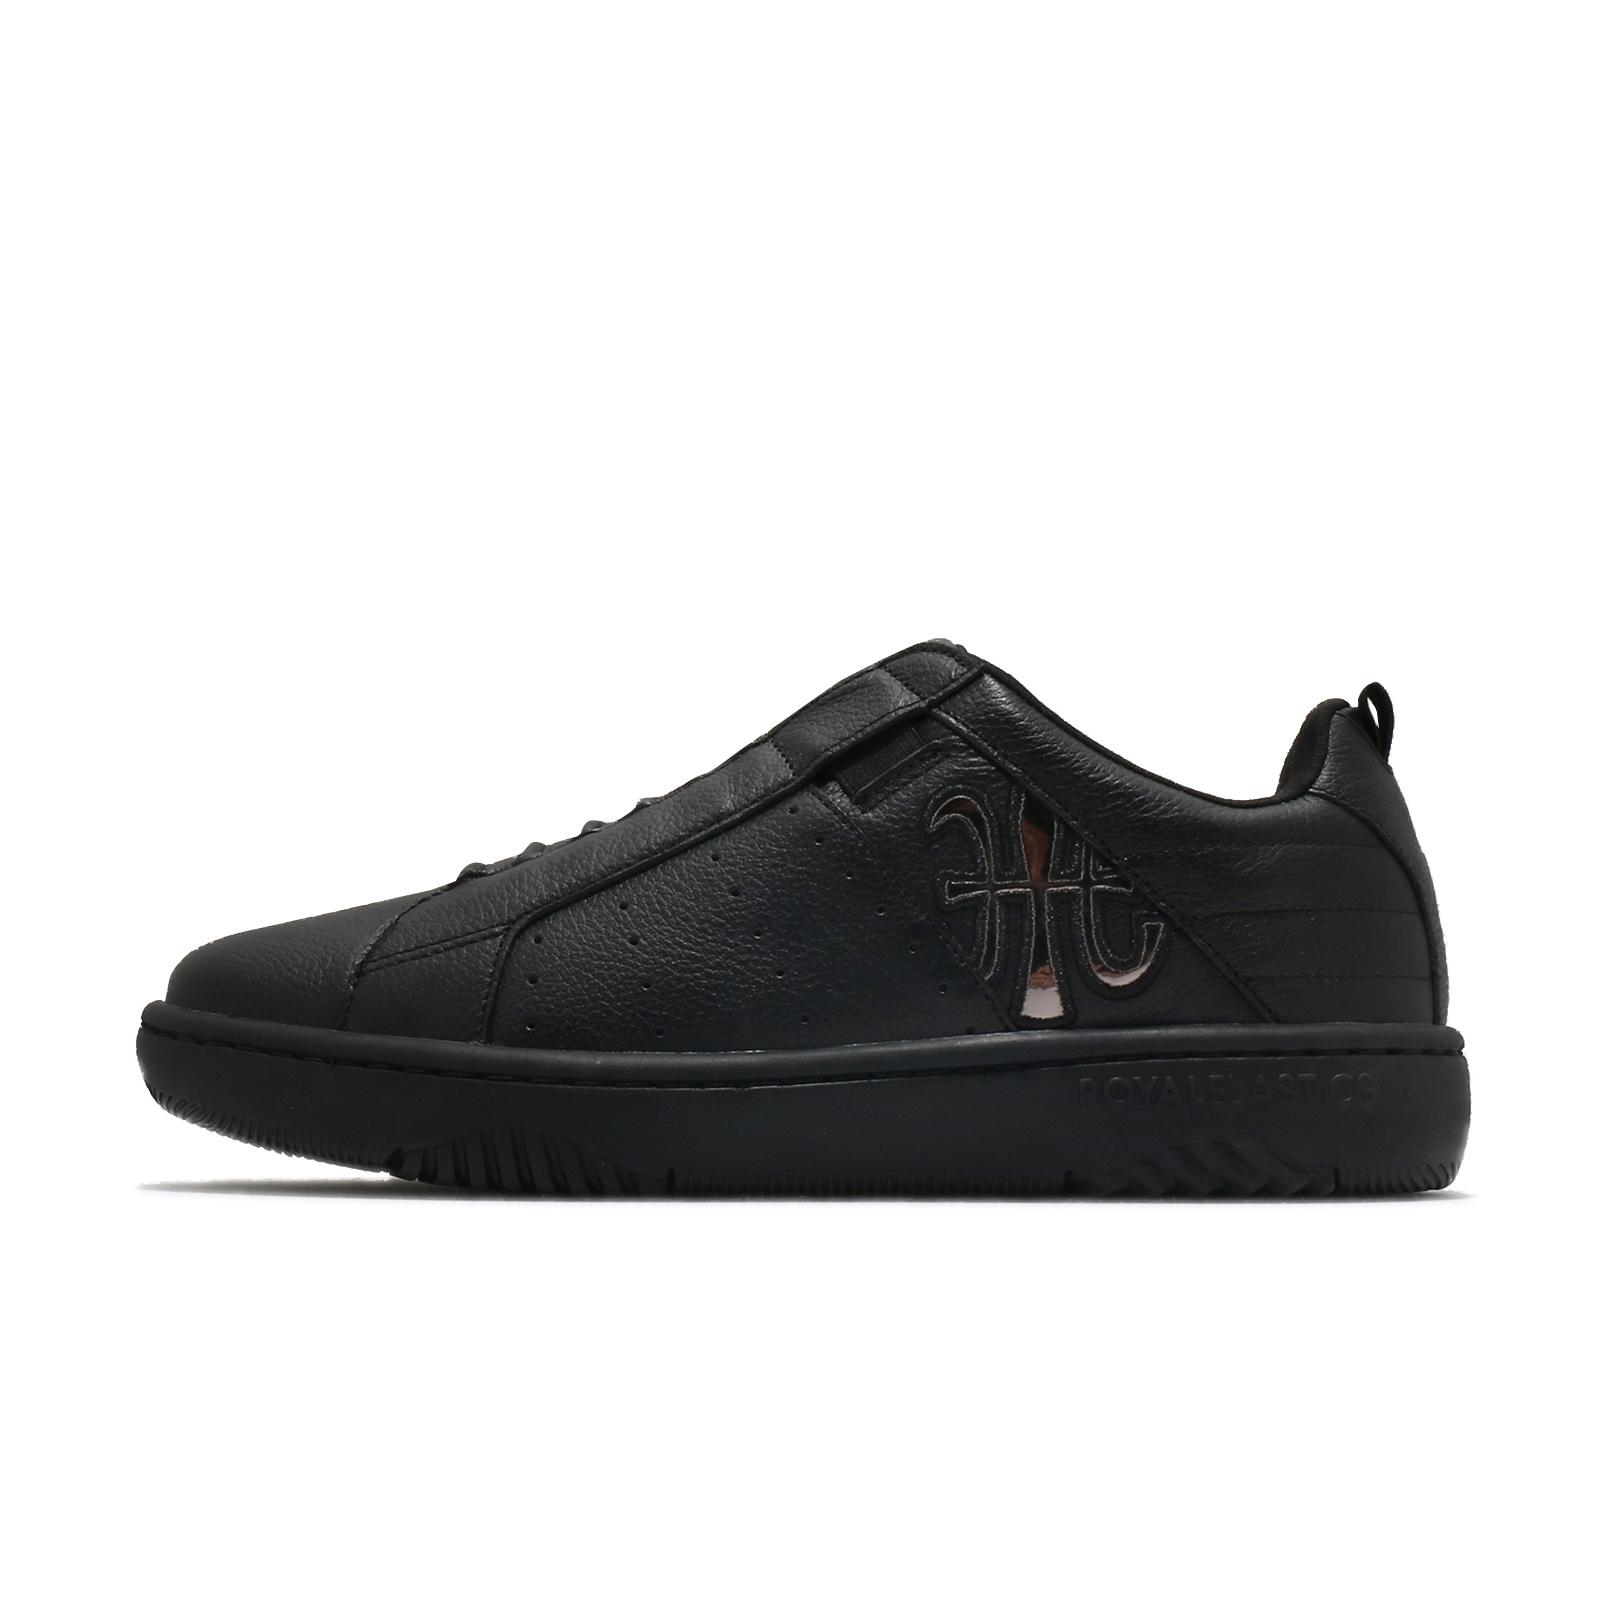 Royal Elastics 休閒鞋 Icon Manhood 2.0 黑 銀 男鞋 06502999 【ACS】